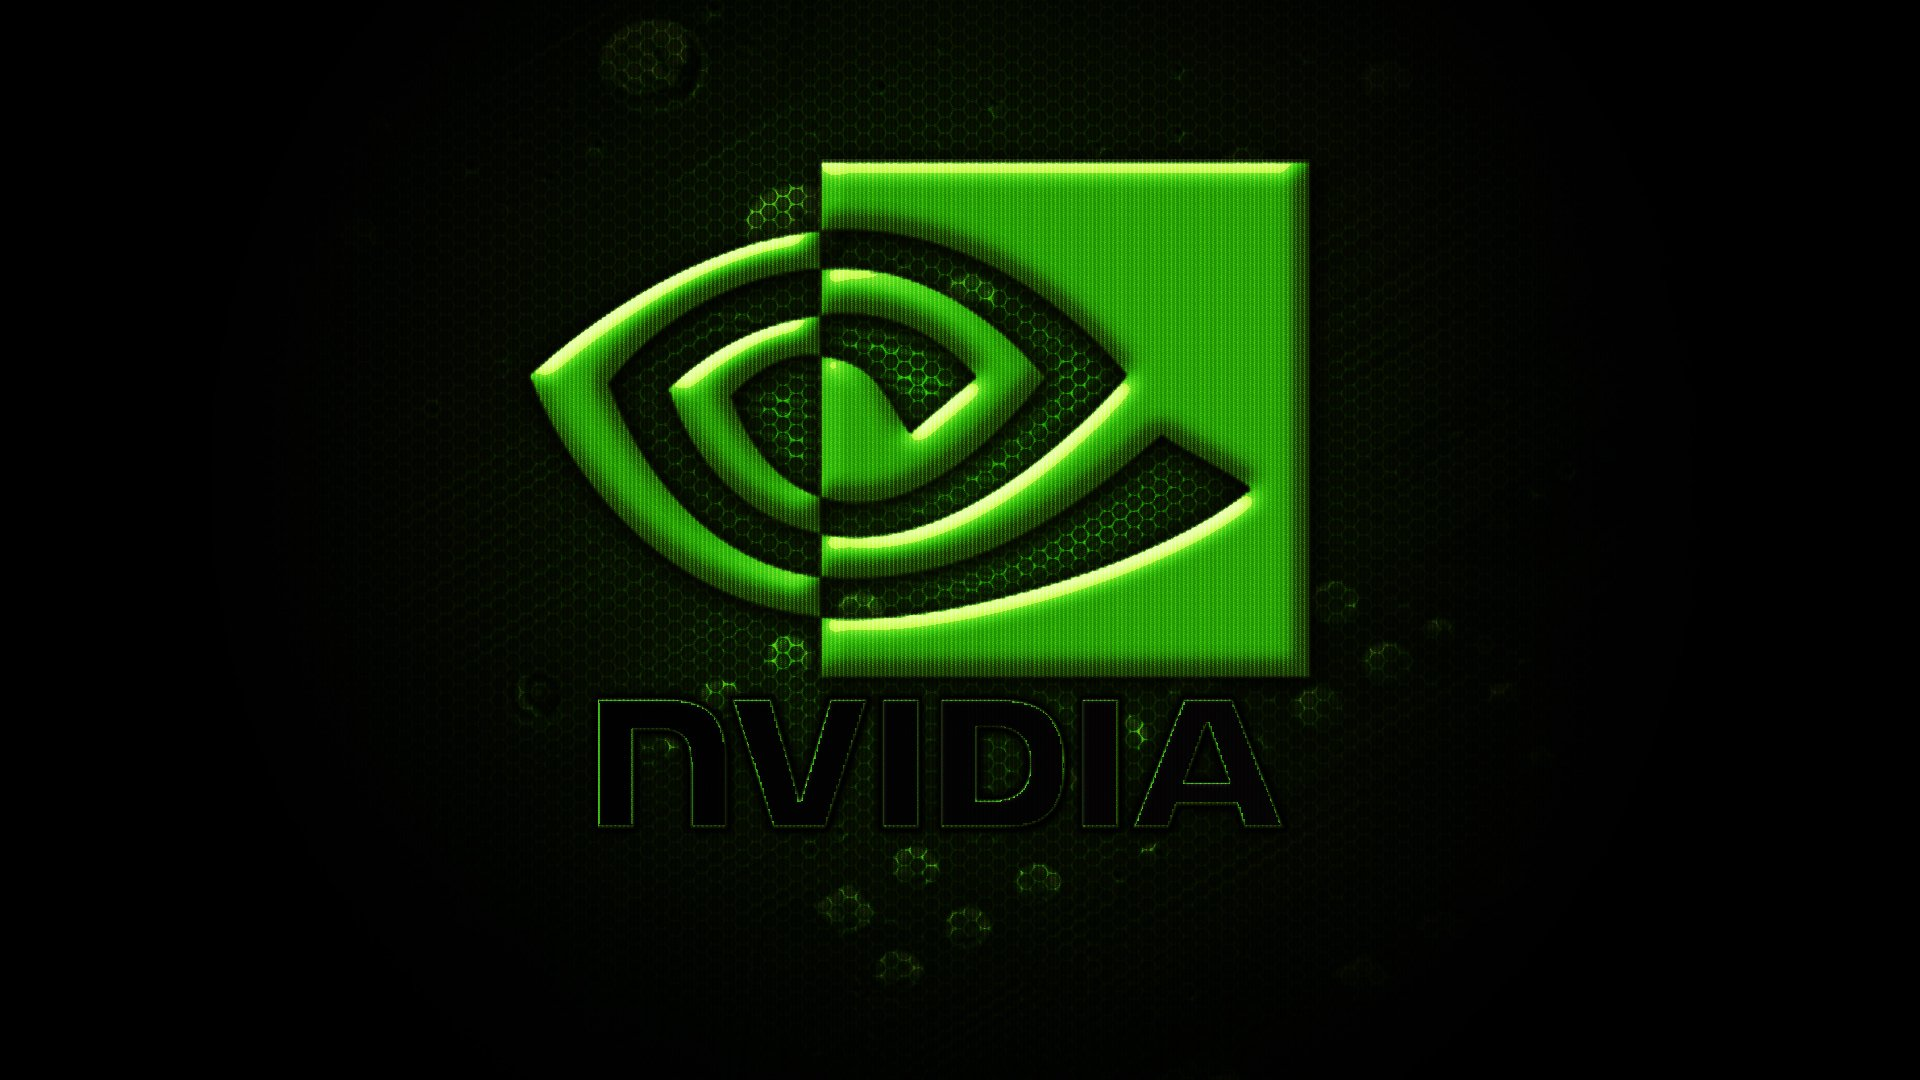 NVIDIA GEFORCE GTX gaming computer wallpaper | 1920x1080 ...